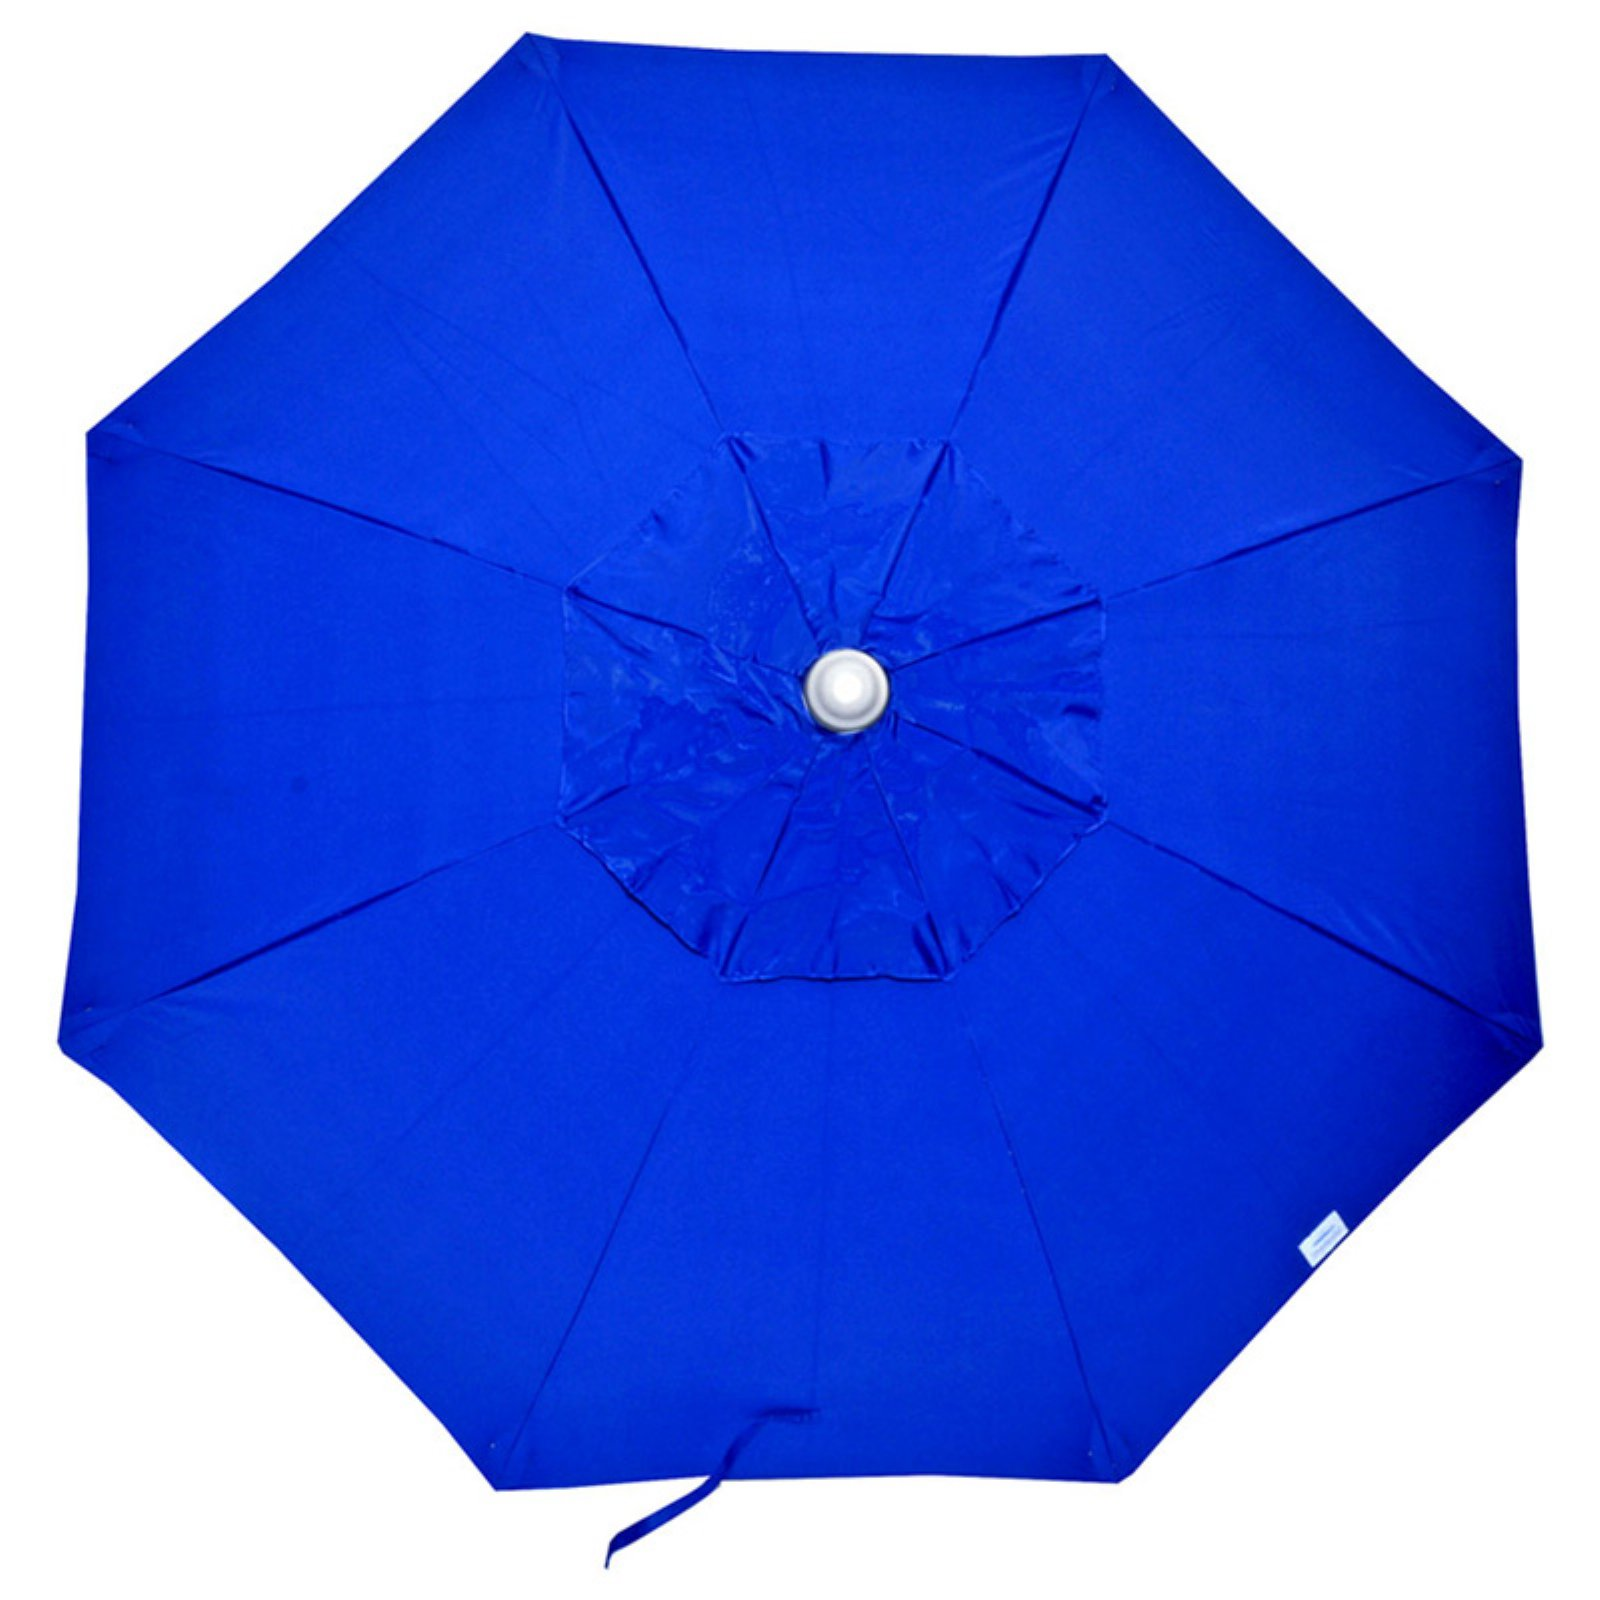 Shadezilla 7.5 ft. Commercial Grade Fiberglass Beach / Patio Umbrella